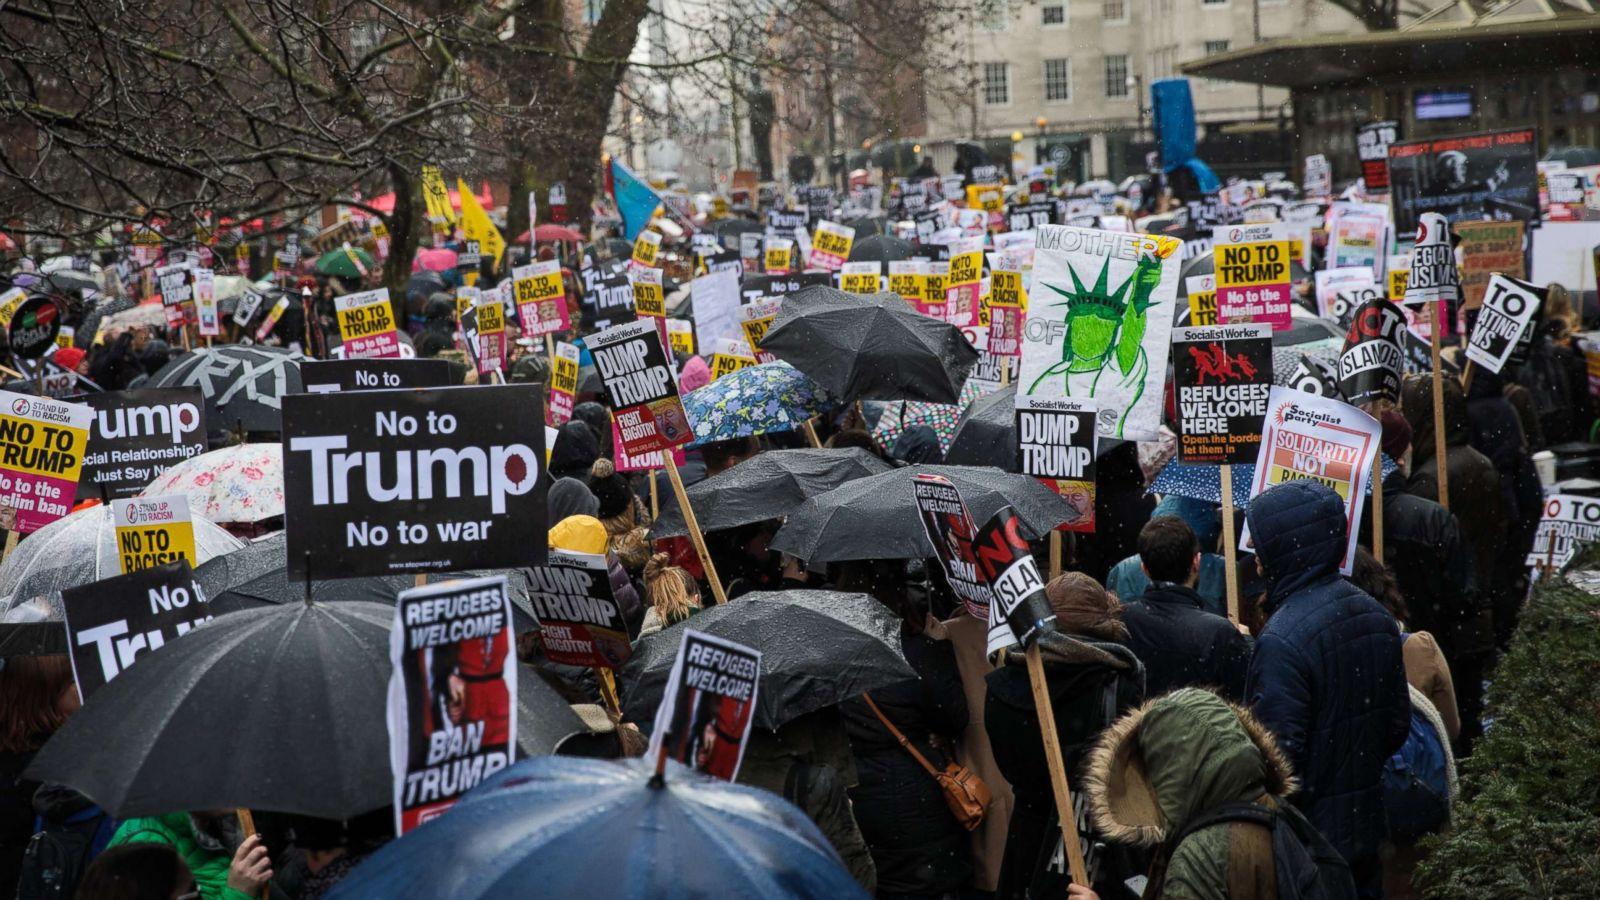 abcnews.go.com - Elizabeth Brown-Kaiser - Trump visits UK amid acrimonious relationship with London